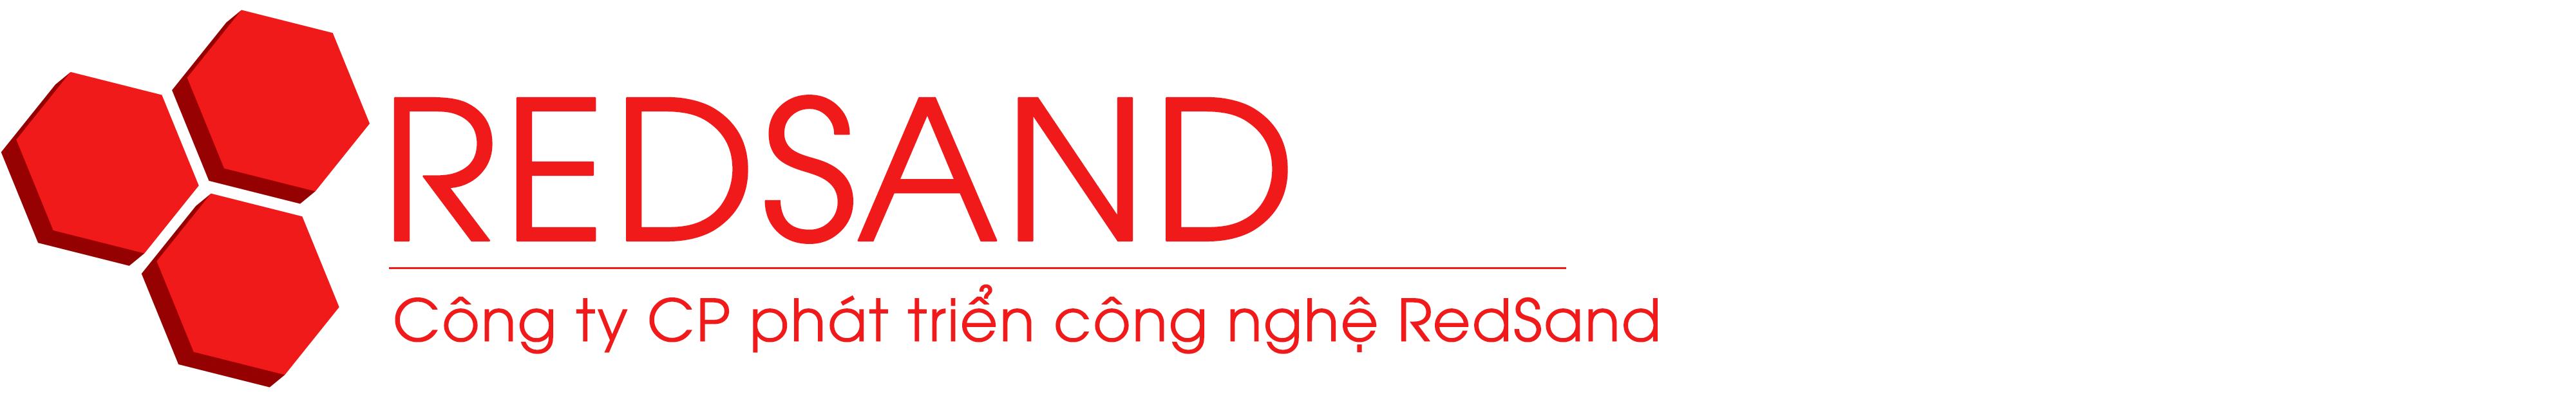 logo- Redsand